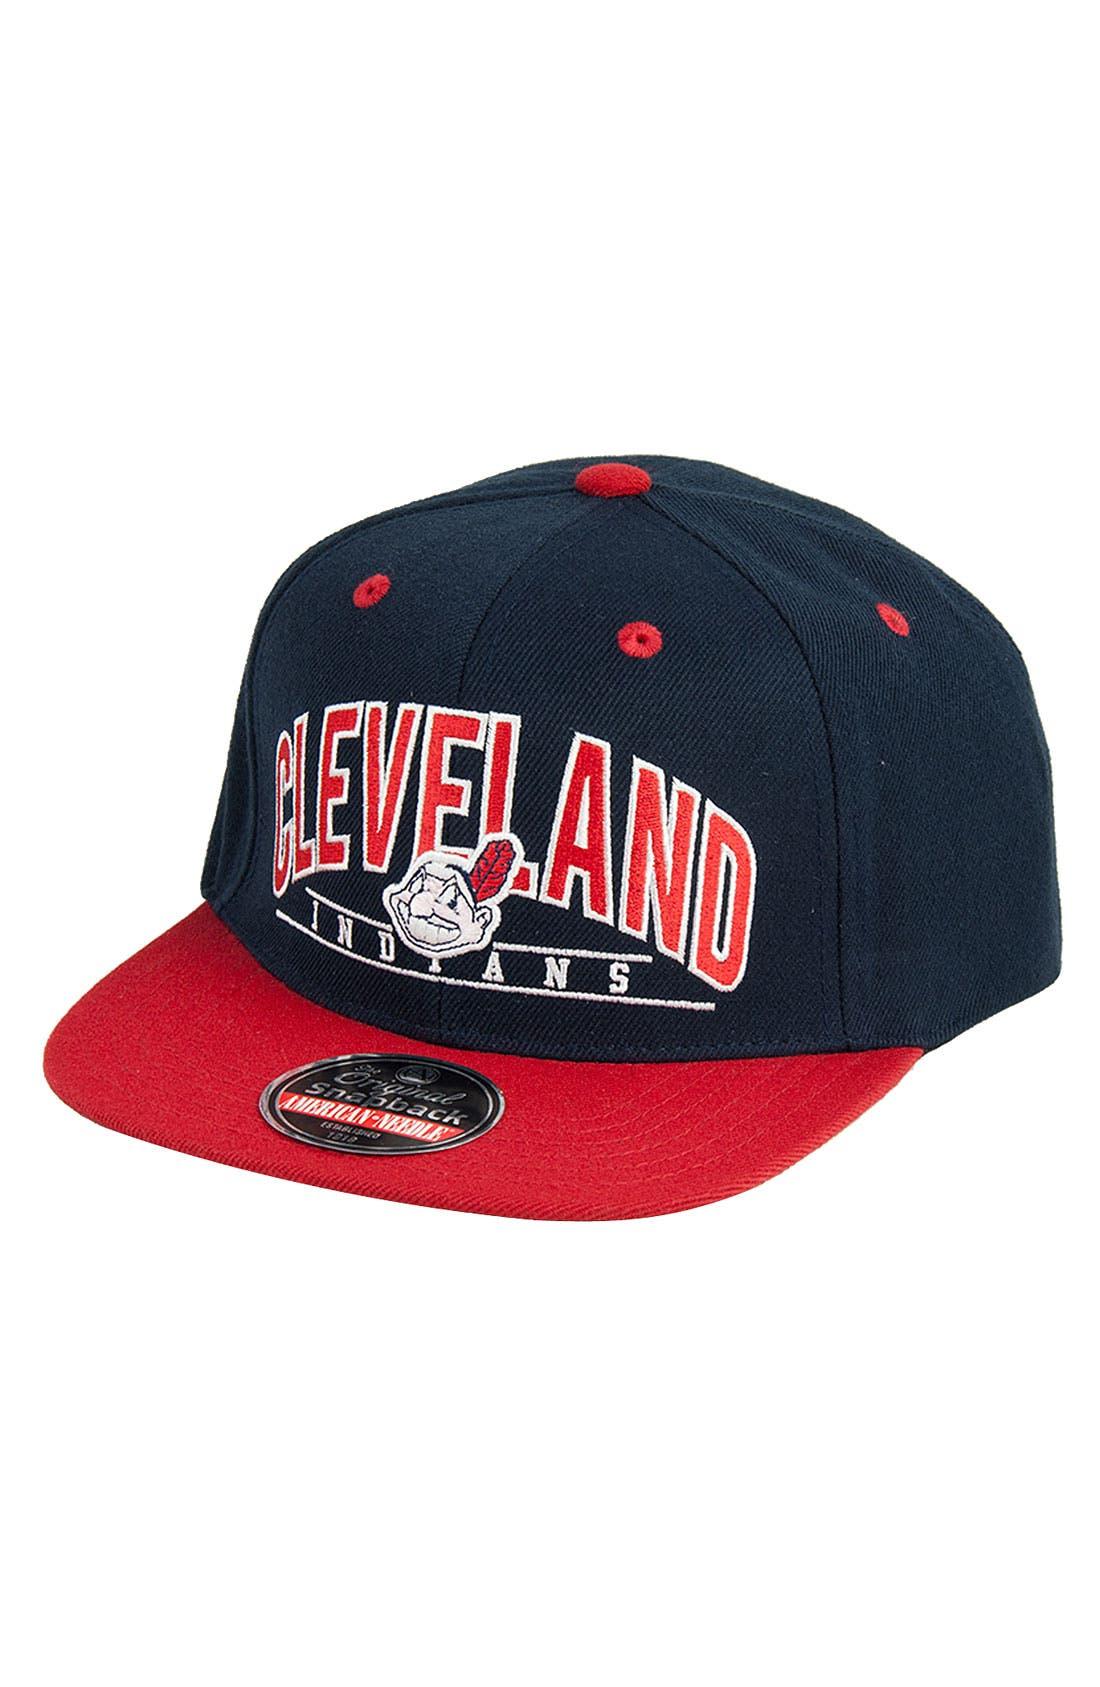 Main Image - American Needle 'Arched Indians' Snapback Baseball Cap